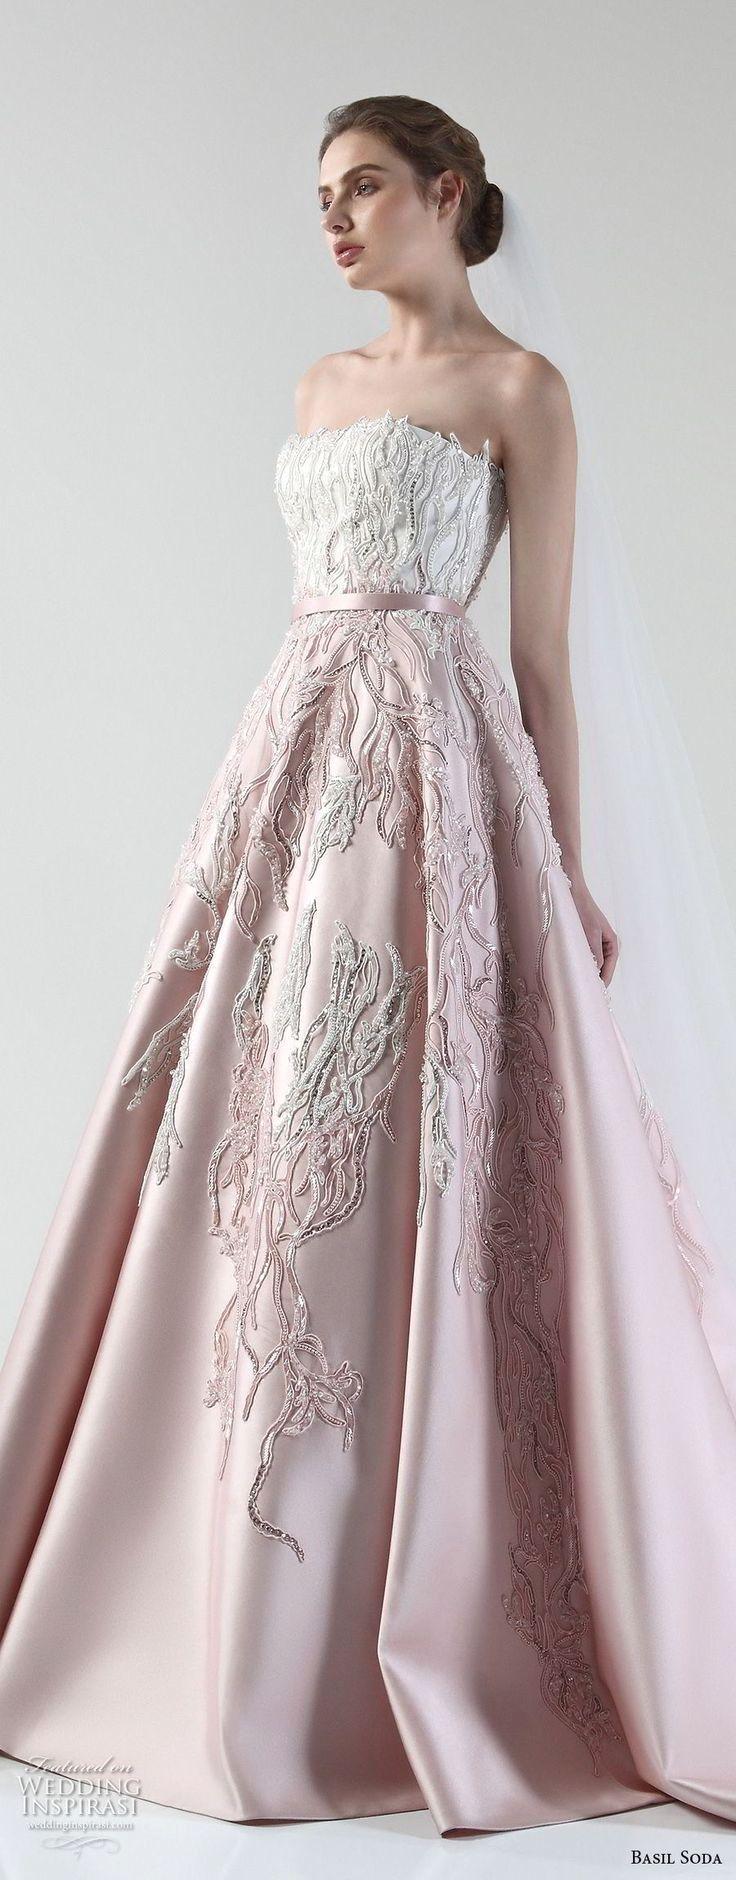 83ad70bd85 Pin od Hanna Zagórska na sukienki na bal gimnazjalny